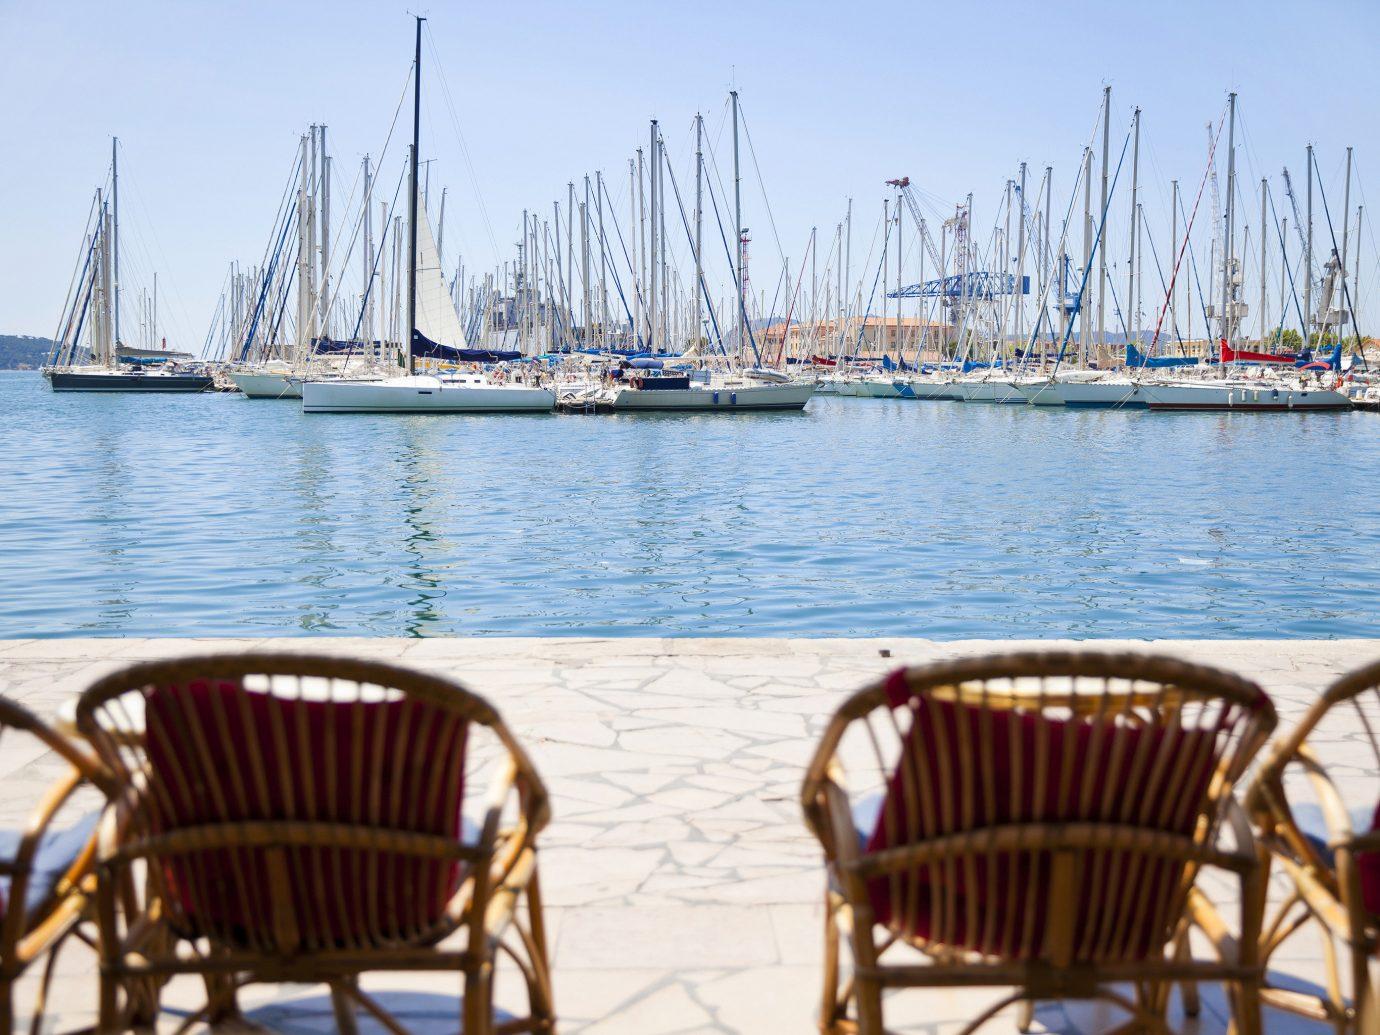 Road Trips Trip Ideas outdoor sky water chair marina Boat Harbor dock scene port watercraft sailing ship Sea ship boating sailboat tall ship water transportation windjammer day